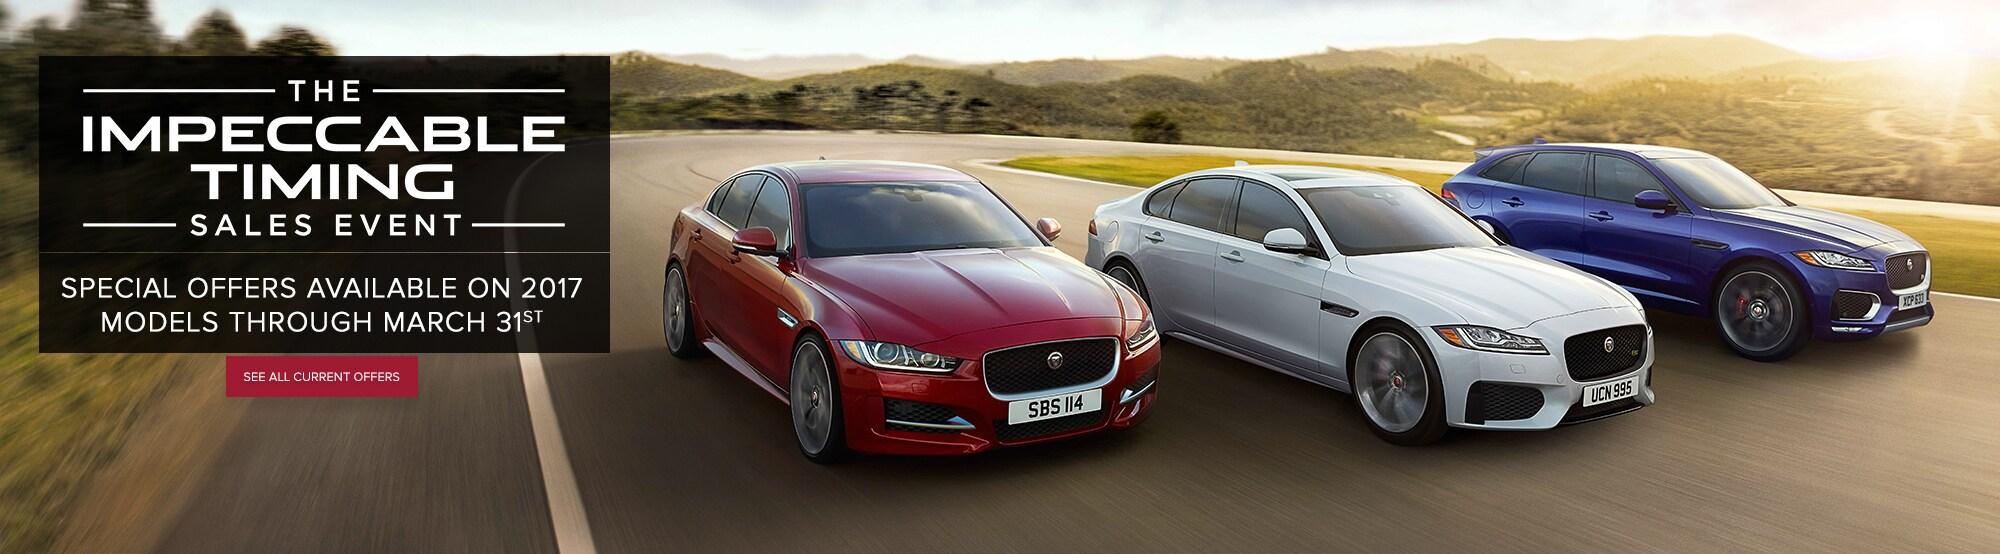 Crest Jaguar of Woodbridge New 2015 2016 Jaguar & Used